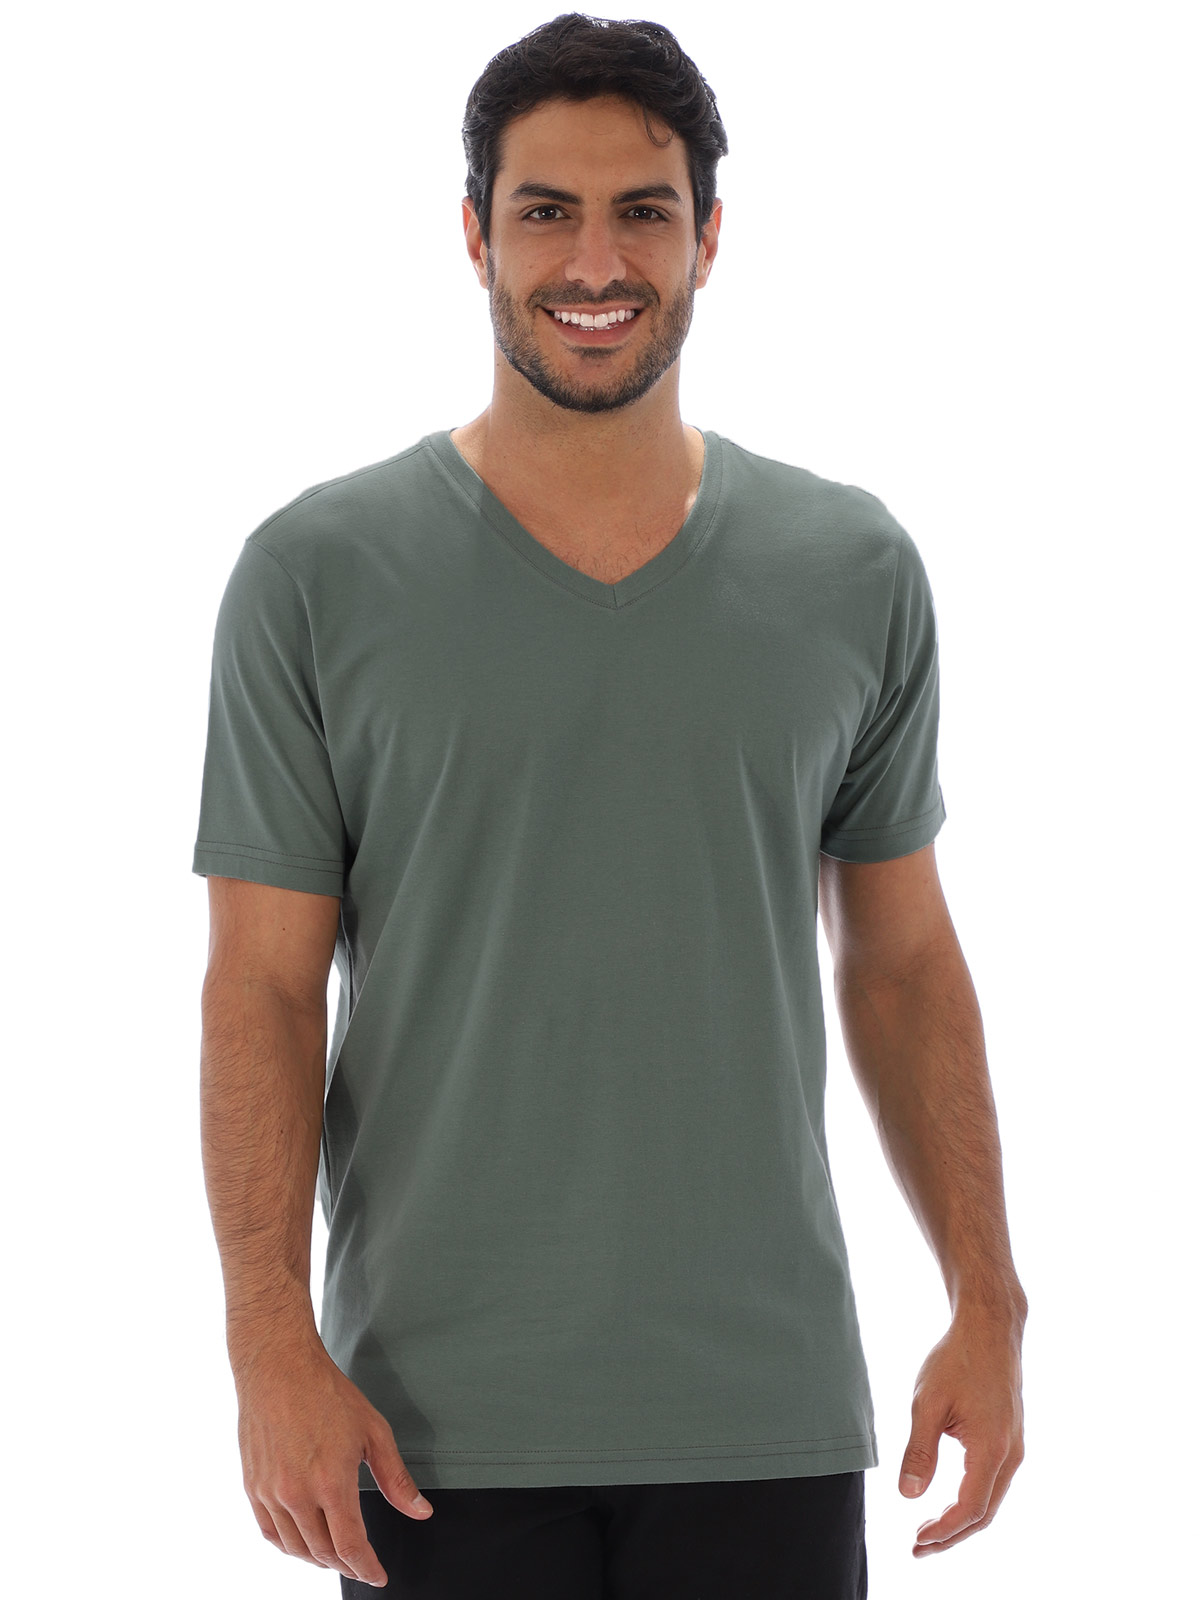 Camiseta Anistia Basica Decote V. Lisa Concreto